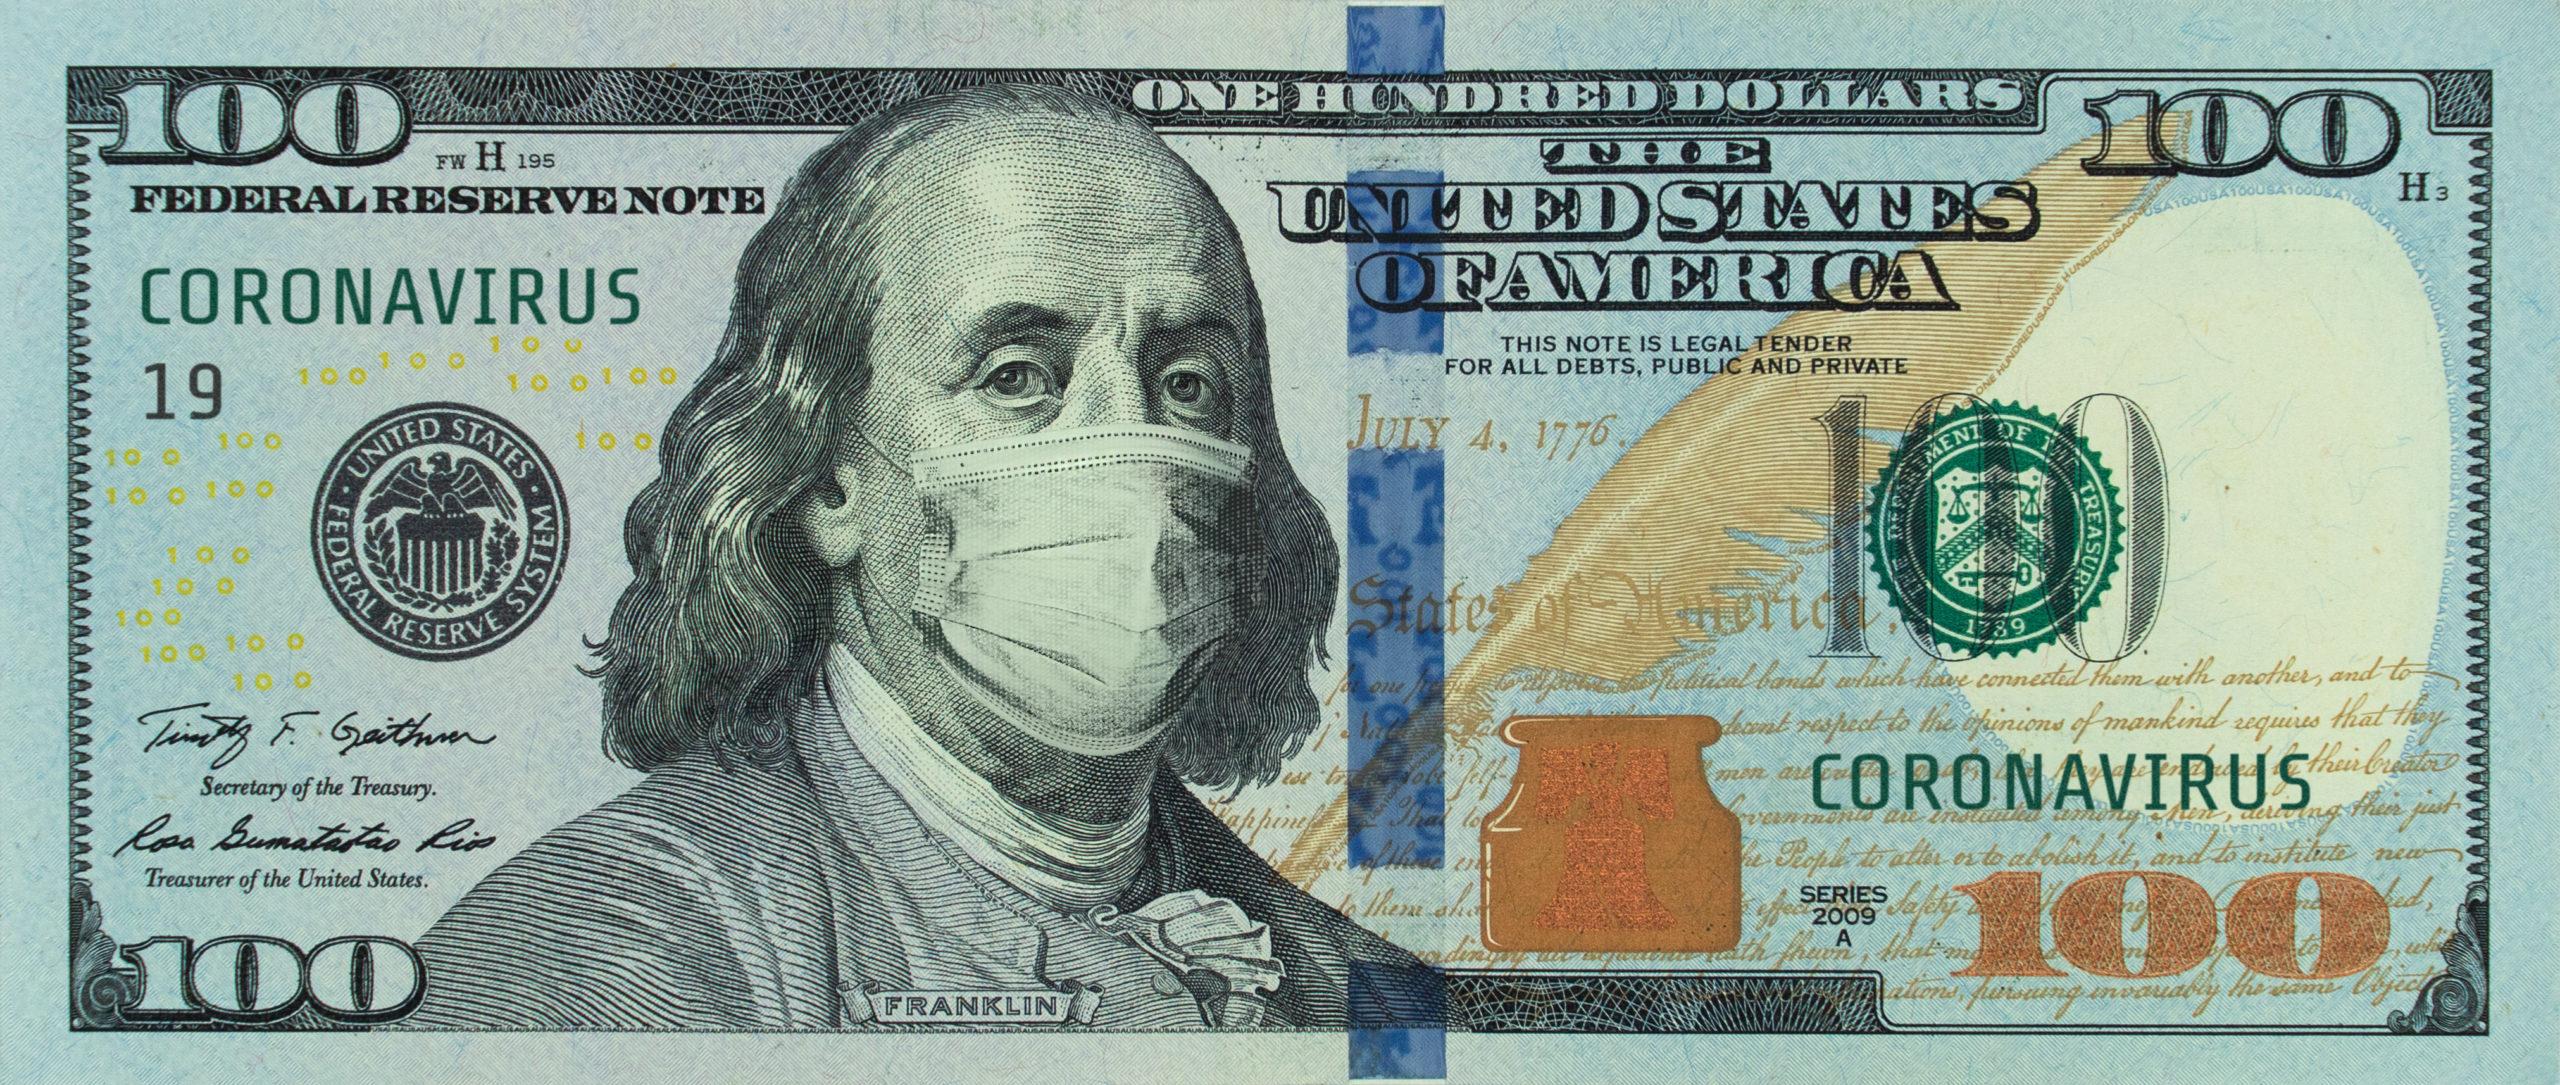 a coronavirus $100 bill with Benjamin Franklin wearing a mask